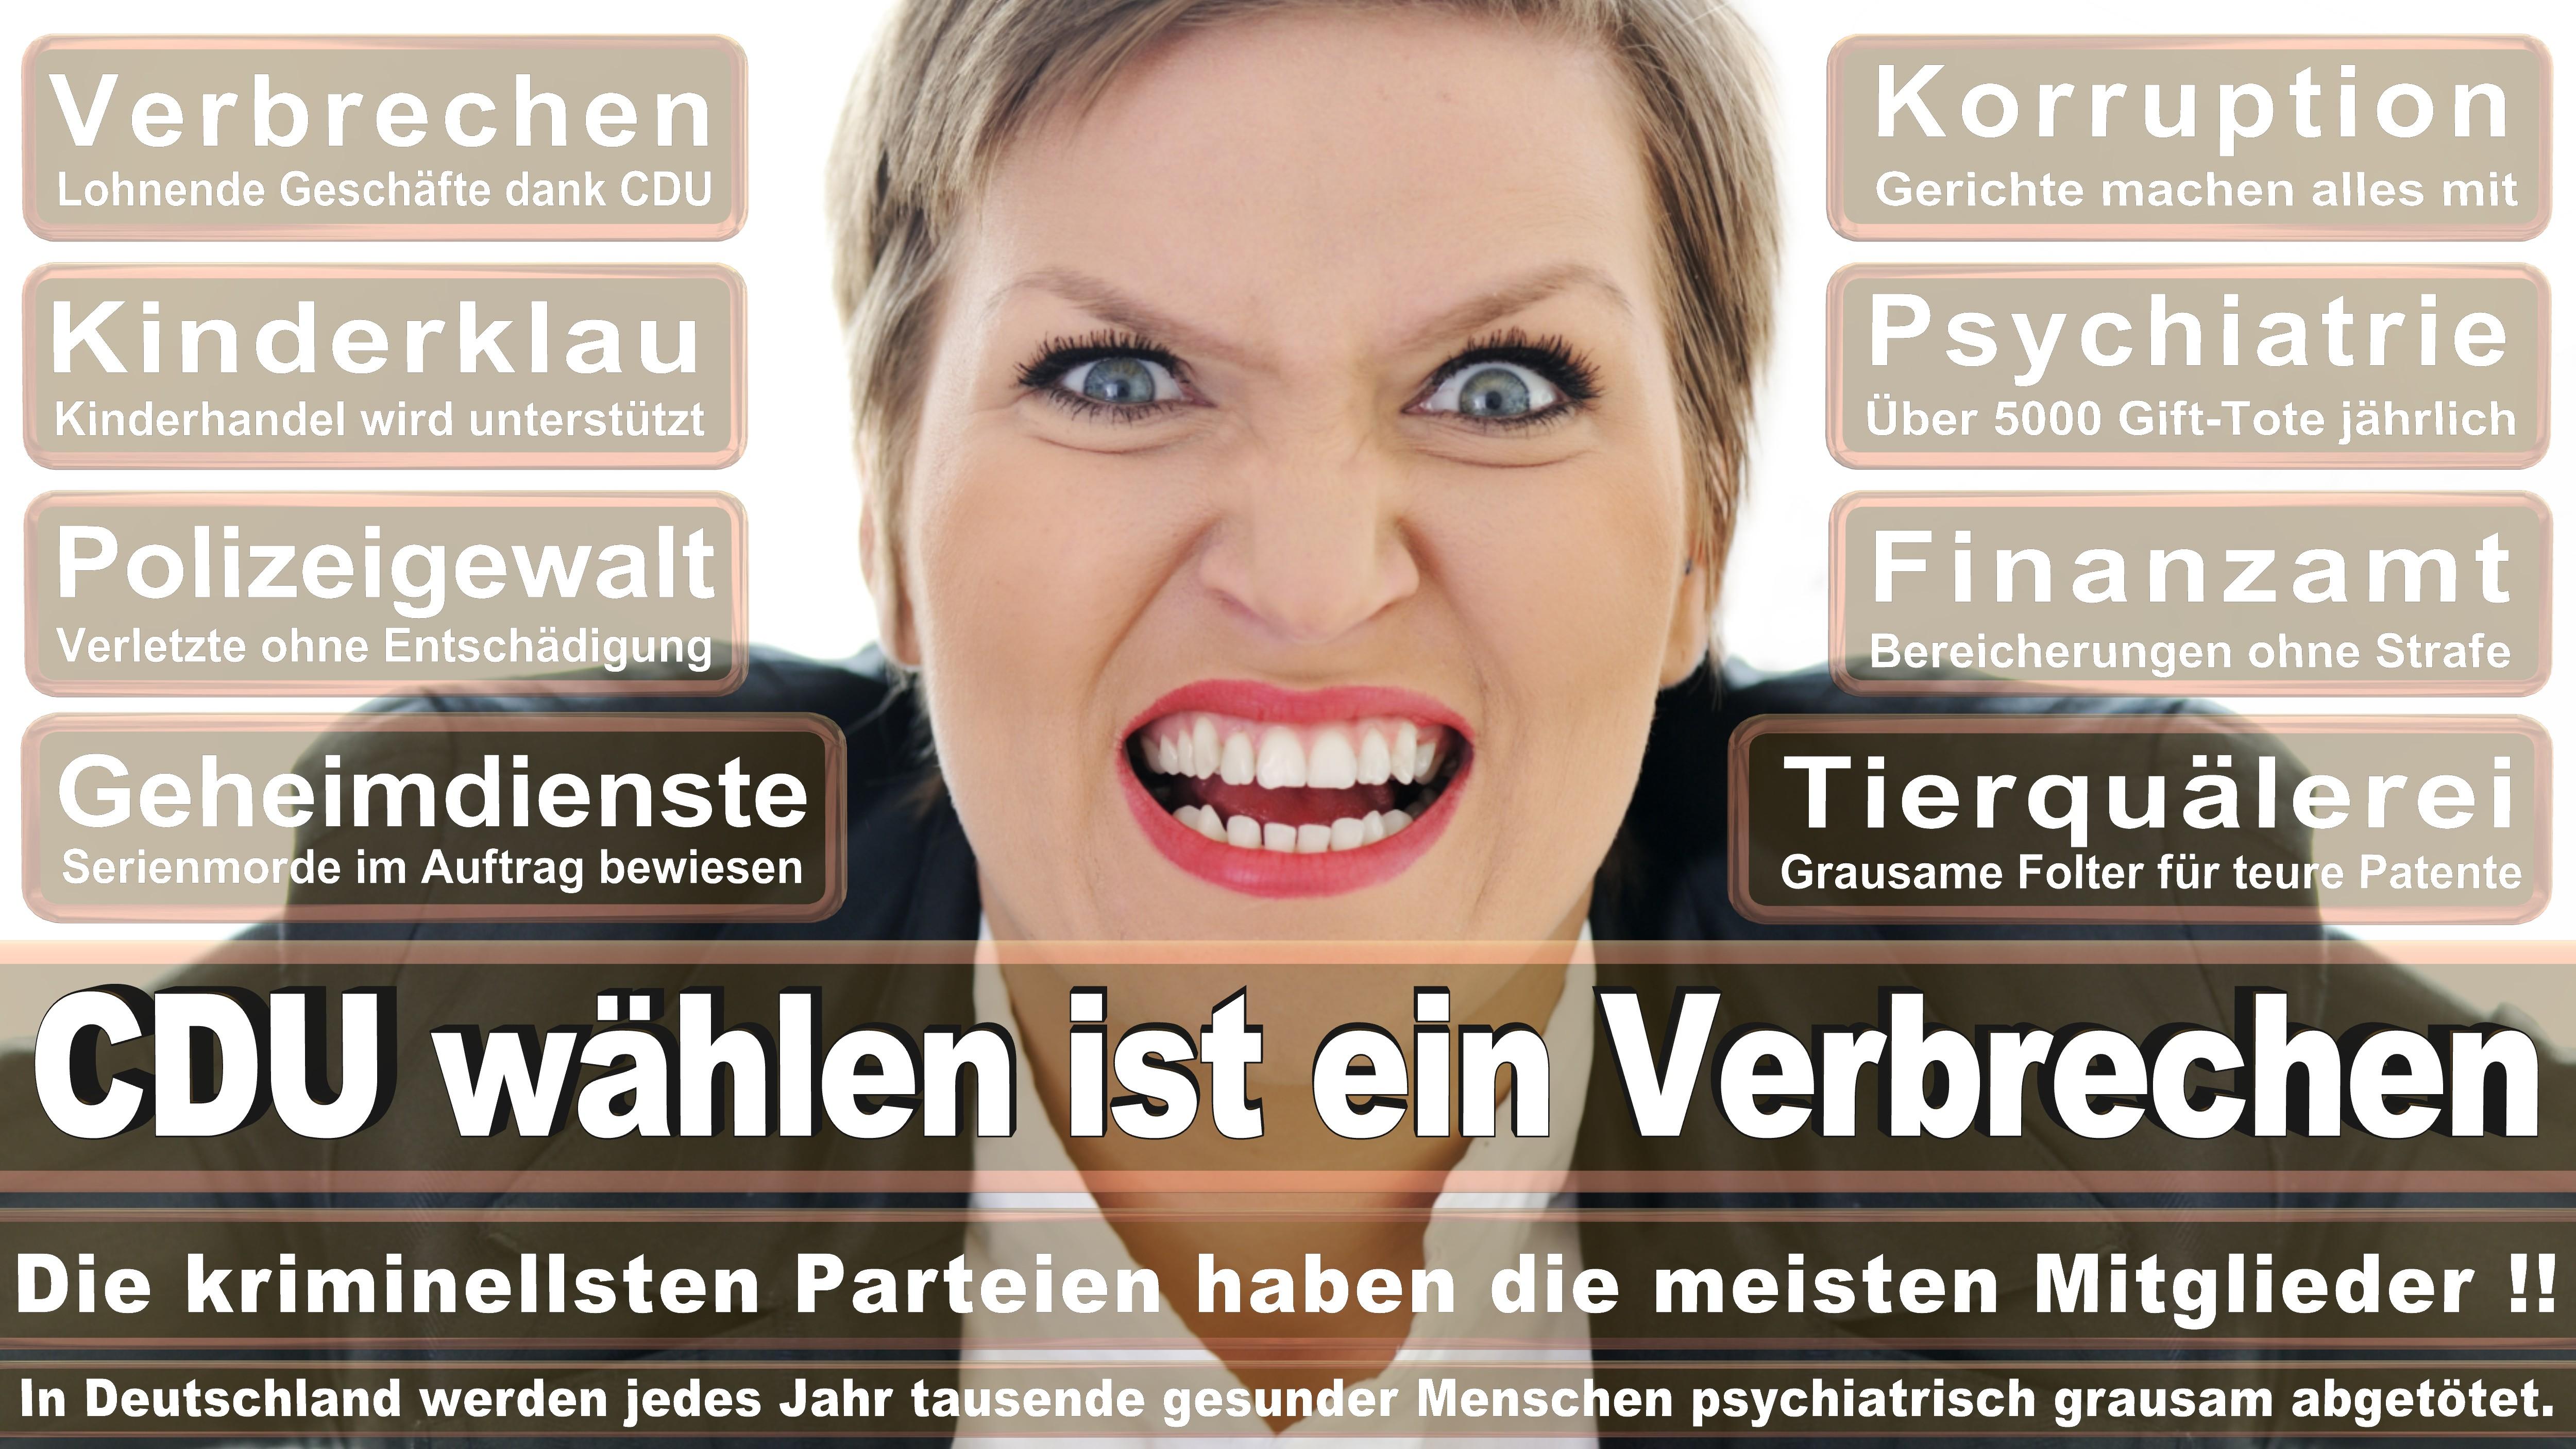 Johannes Selle CDU CSU Politiker